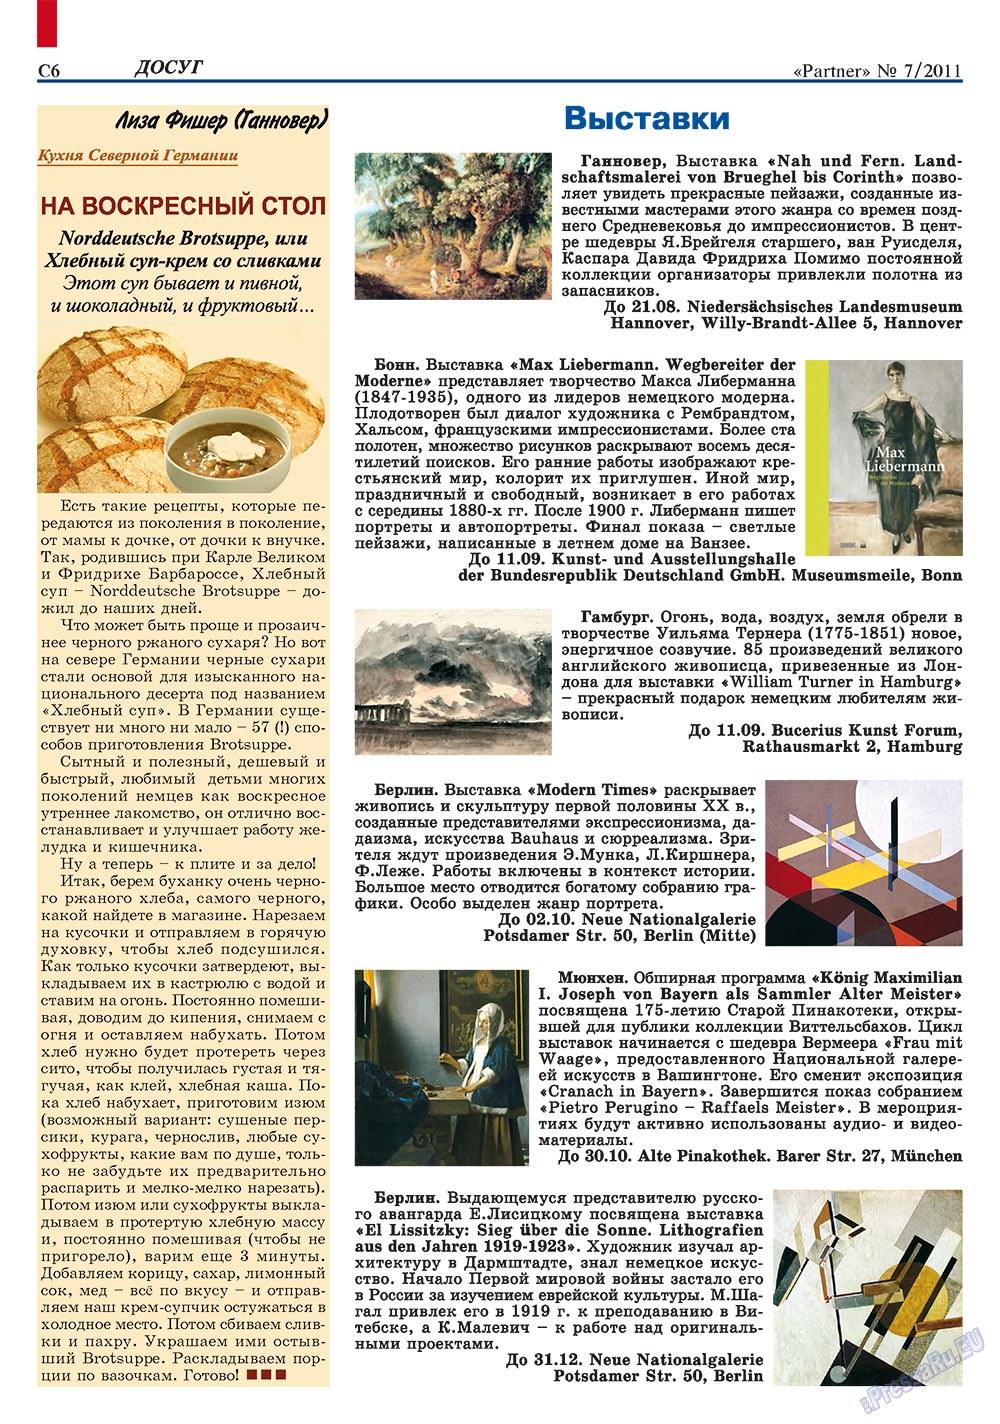 Партнер-север (журнал). 2011 год, номер 7, стр. 64